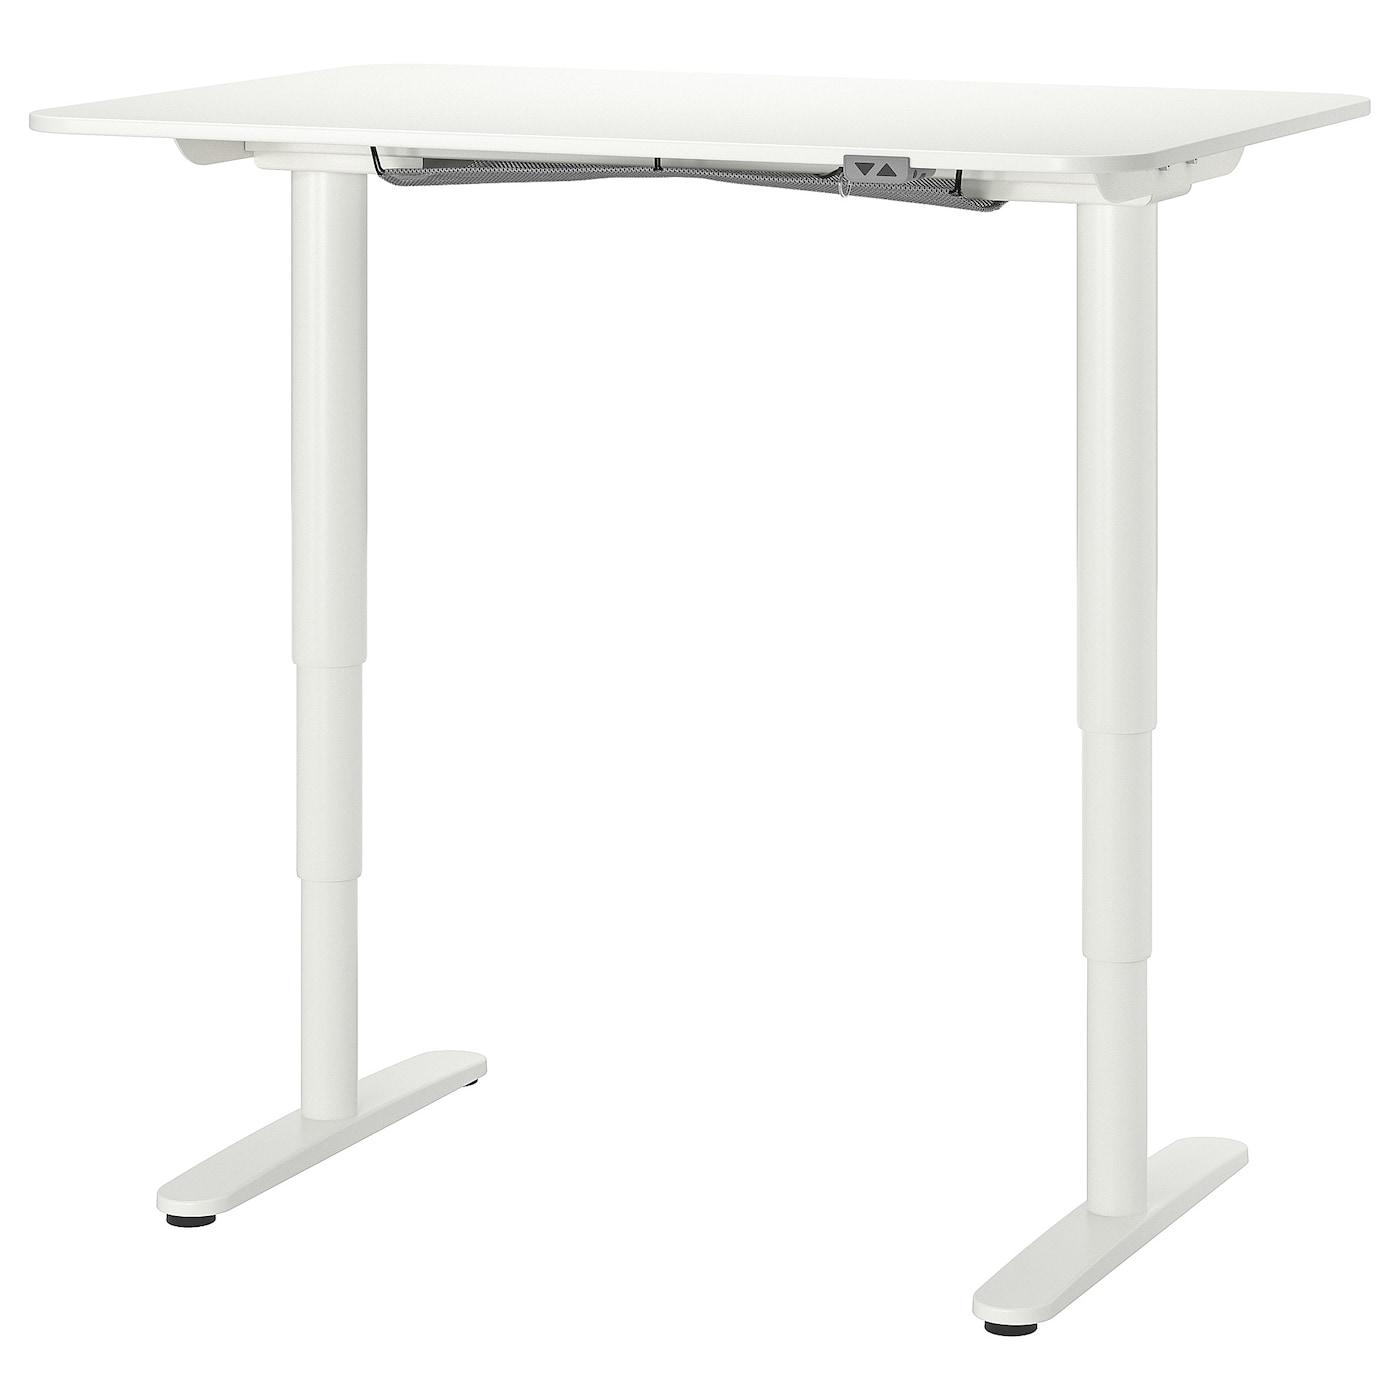 BEKANT Desk sit/stand, white, 120x80 cm - IKEA Ireland